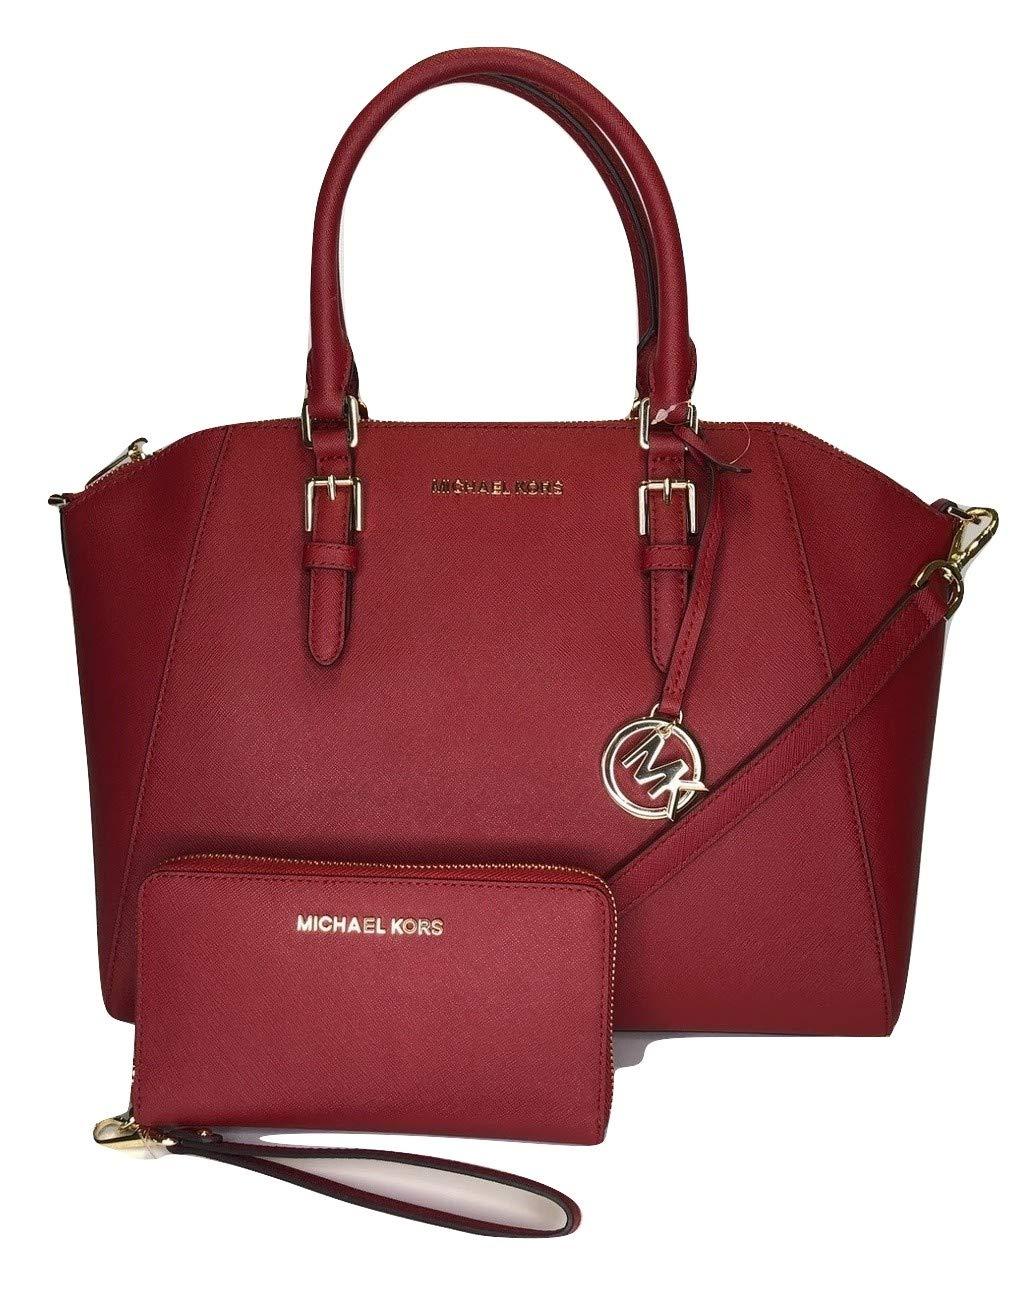 MICHAEL Michael Kors Ciara Large TZ Satchel bundled with Michael Kors Jet Set Travel Large Phone Wallet Wristlet (Scarlet)